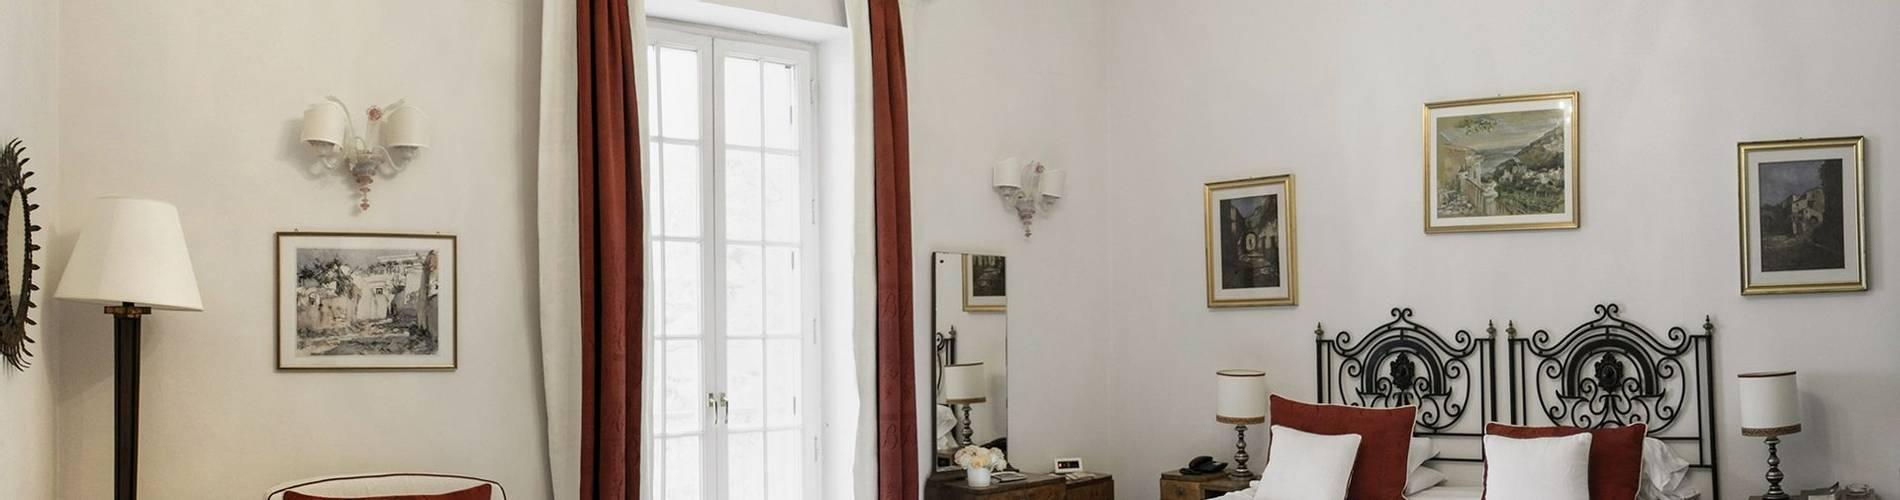 Villa Maria, Amalfi Coast, Italy, Superior room.jpg